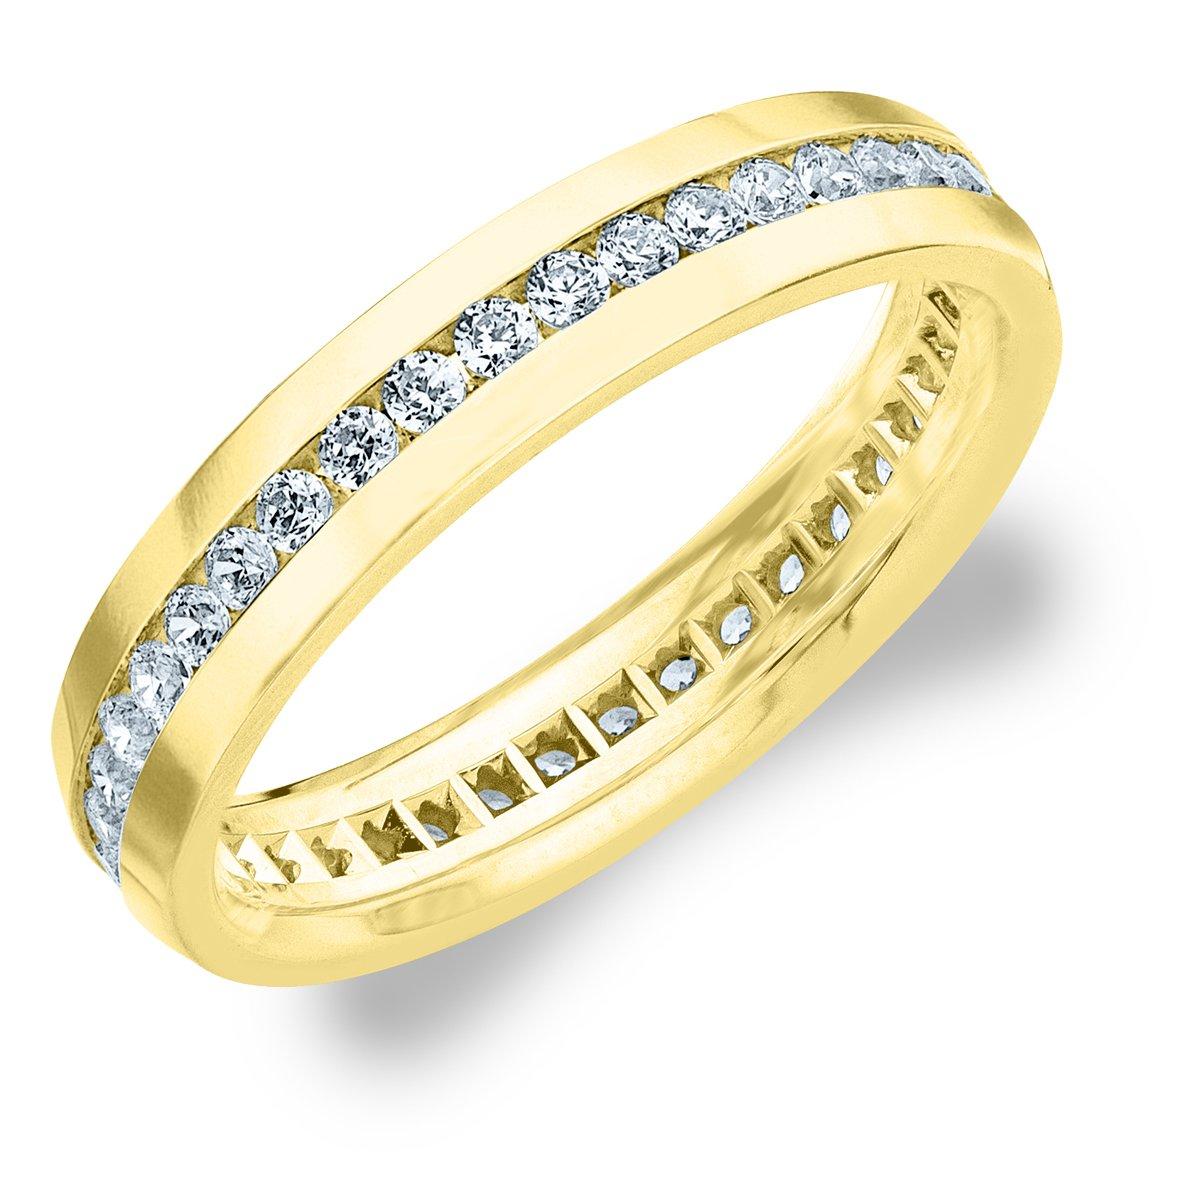 1.0 CTTW Men's Eternity Ring in 18K Yellow Gold, Stunning Mens Diamond Ring Size 9.5